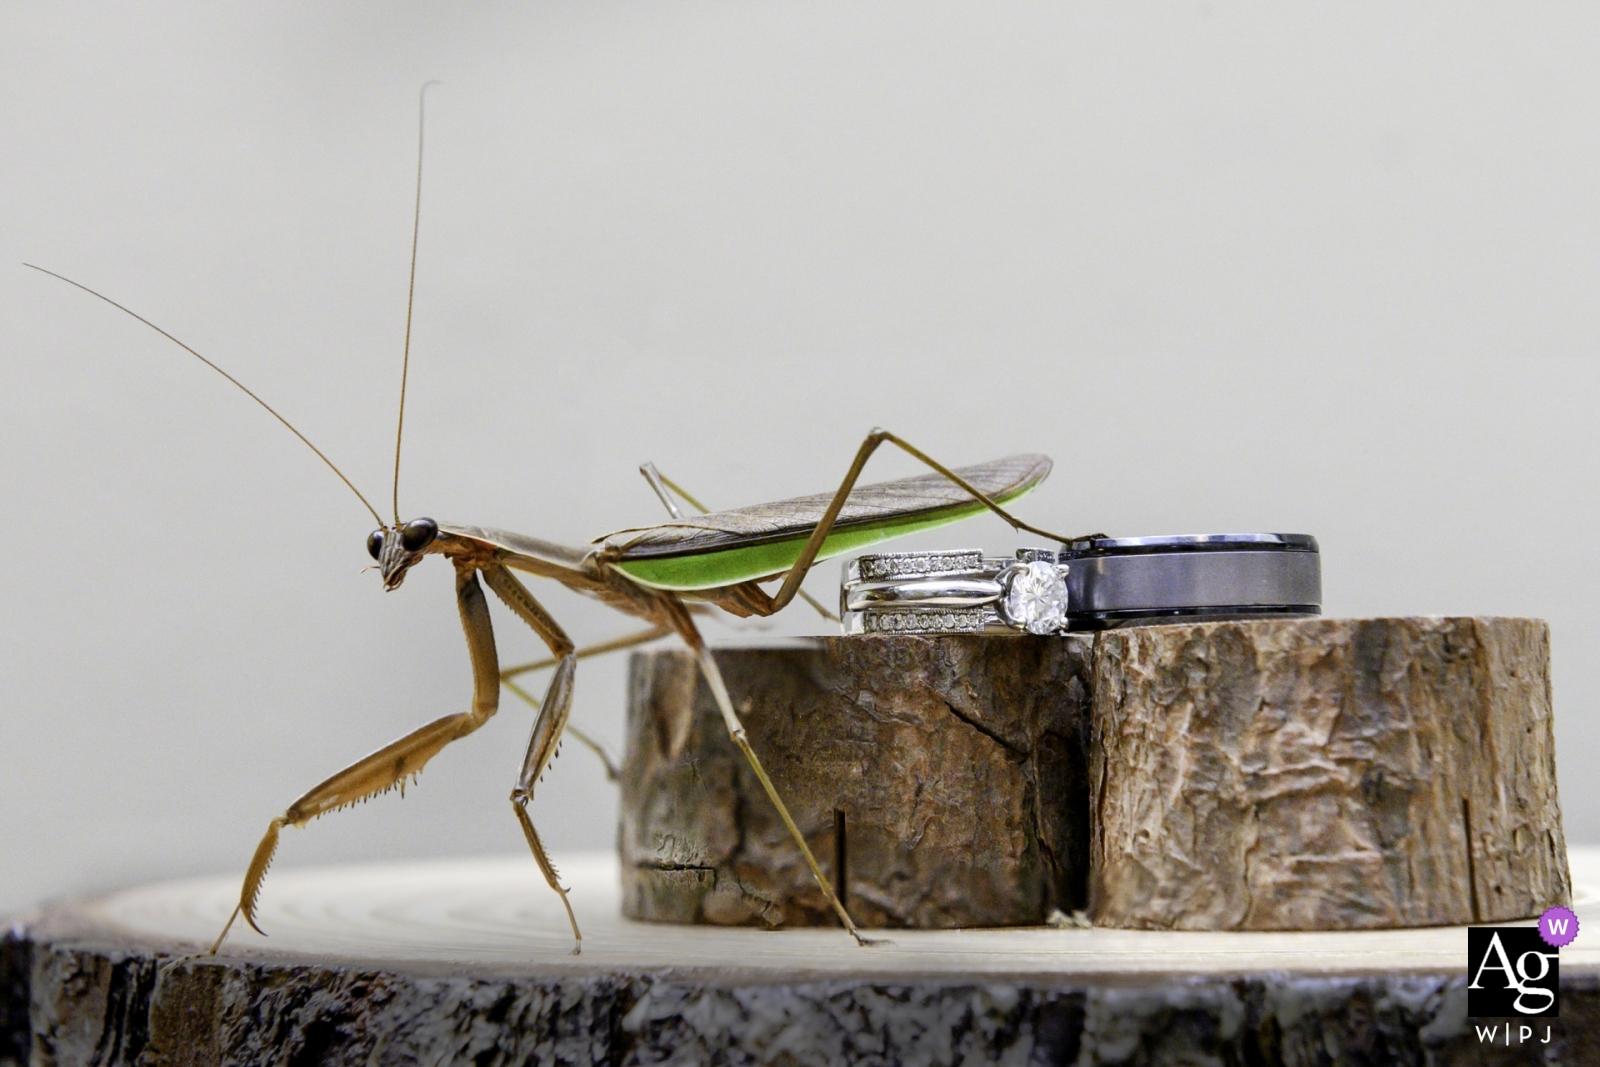 Ring shot at a wedding in upstate NY with a praying mantis